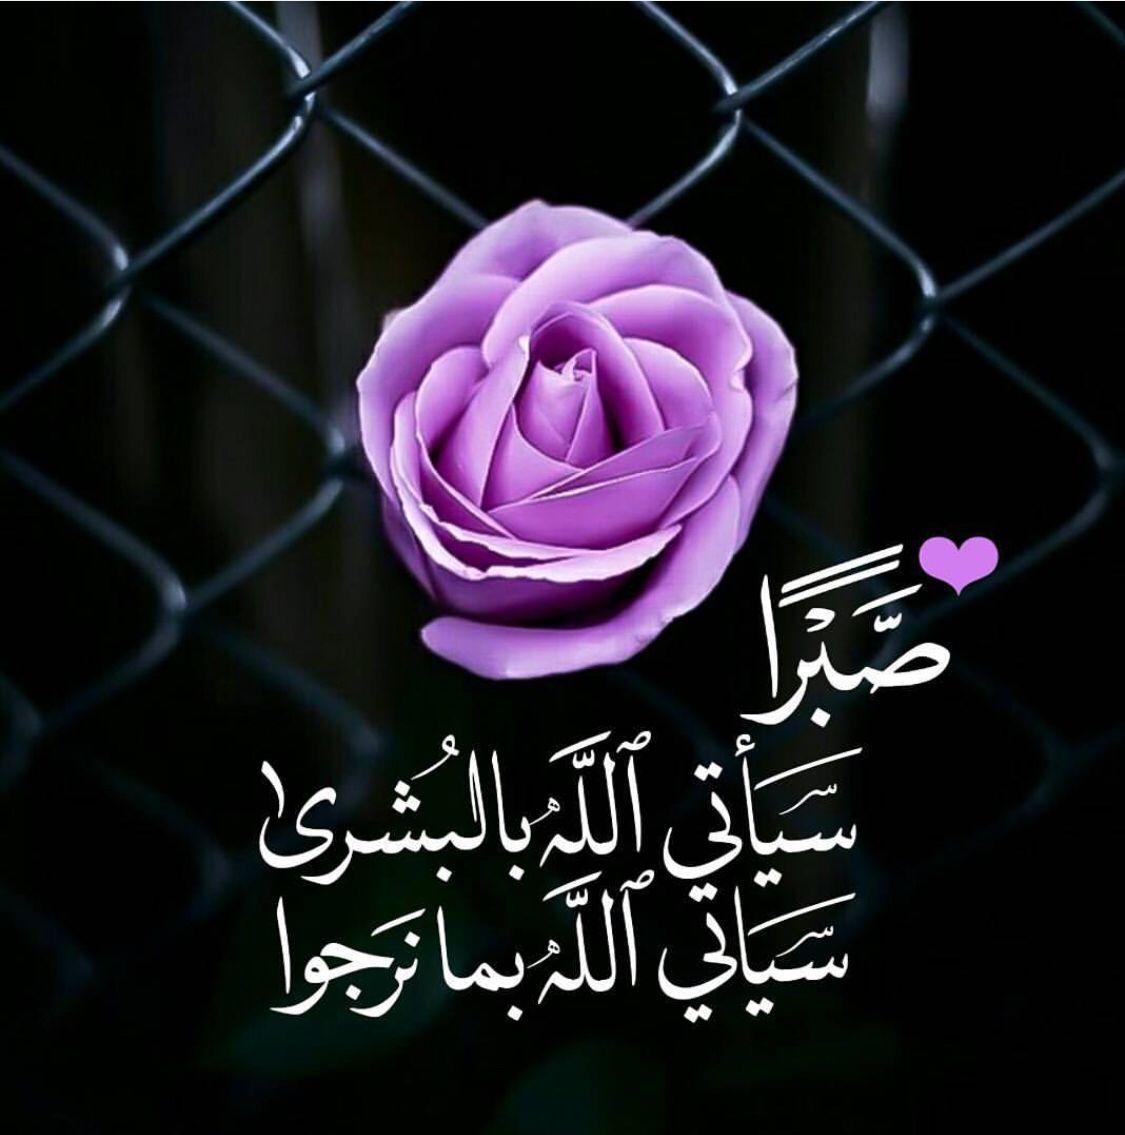 عبارات اسلامية مؤثرة Islamic Quotes Wallpaper Muslim Quotes Islamic Quotes